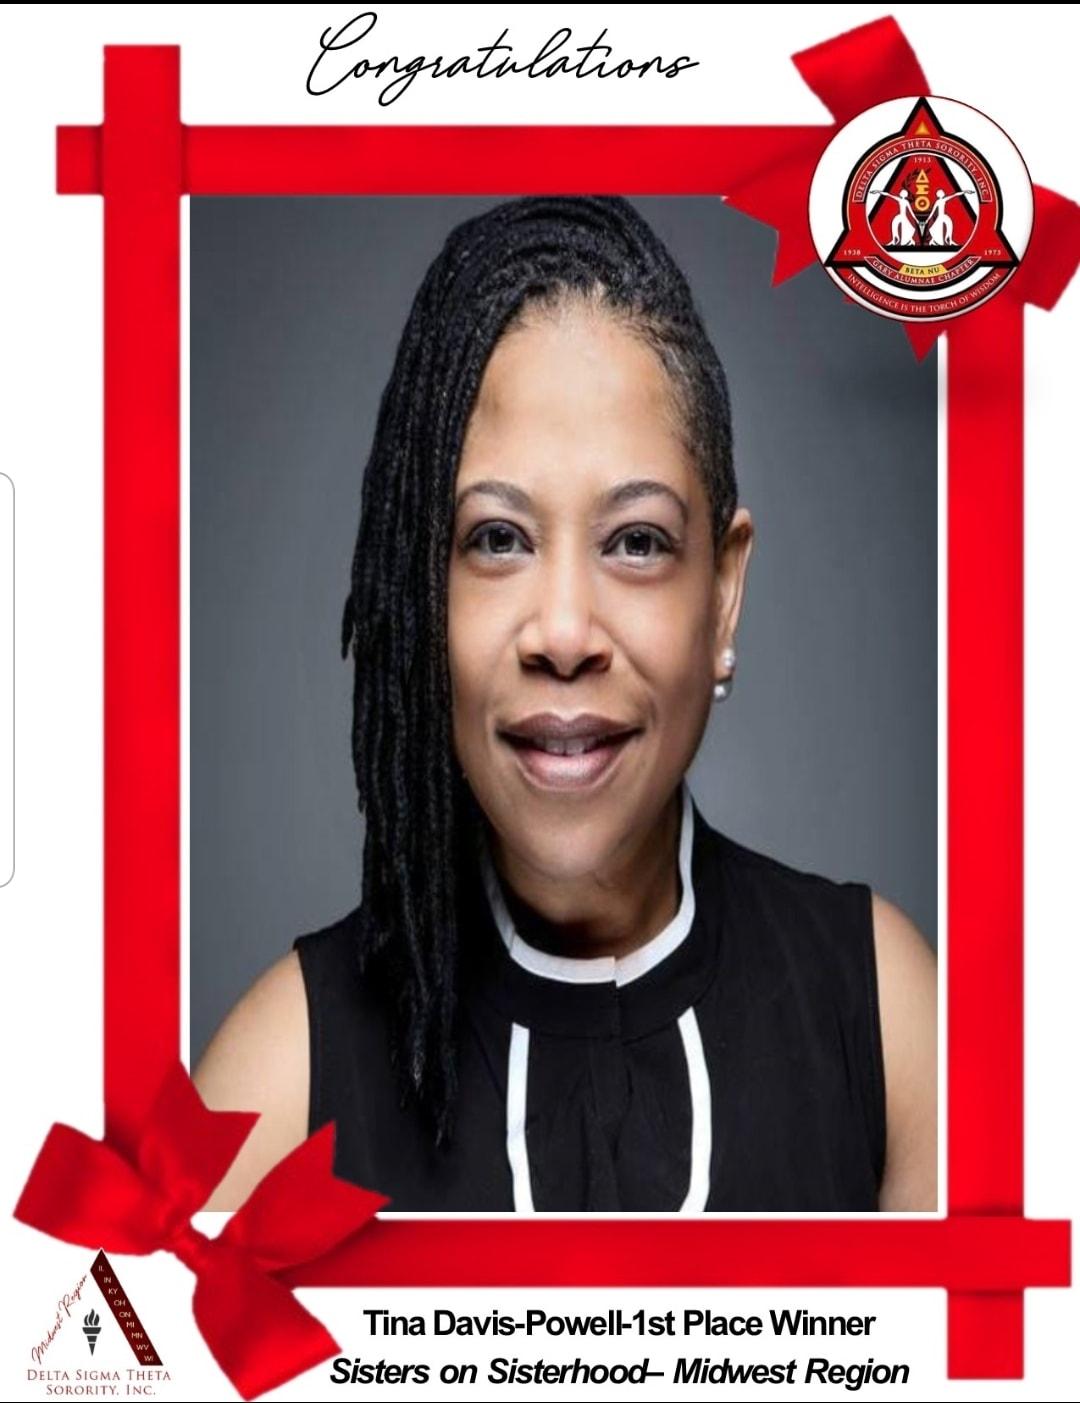 Davis-Powell wins Sister on Sisterhood Award for the Midwest Region!